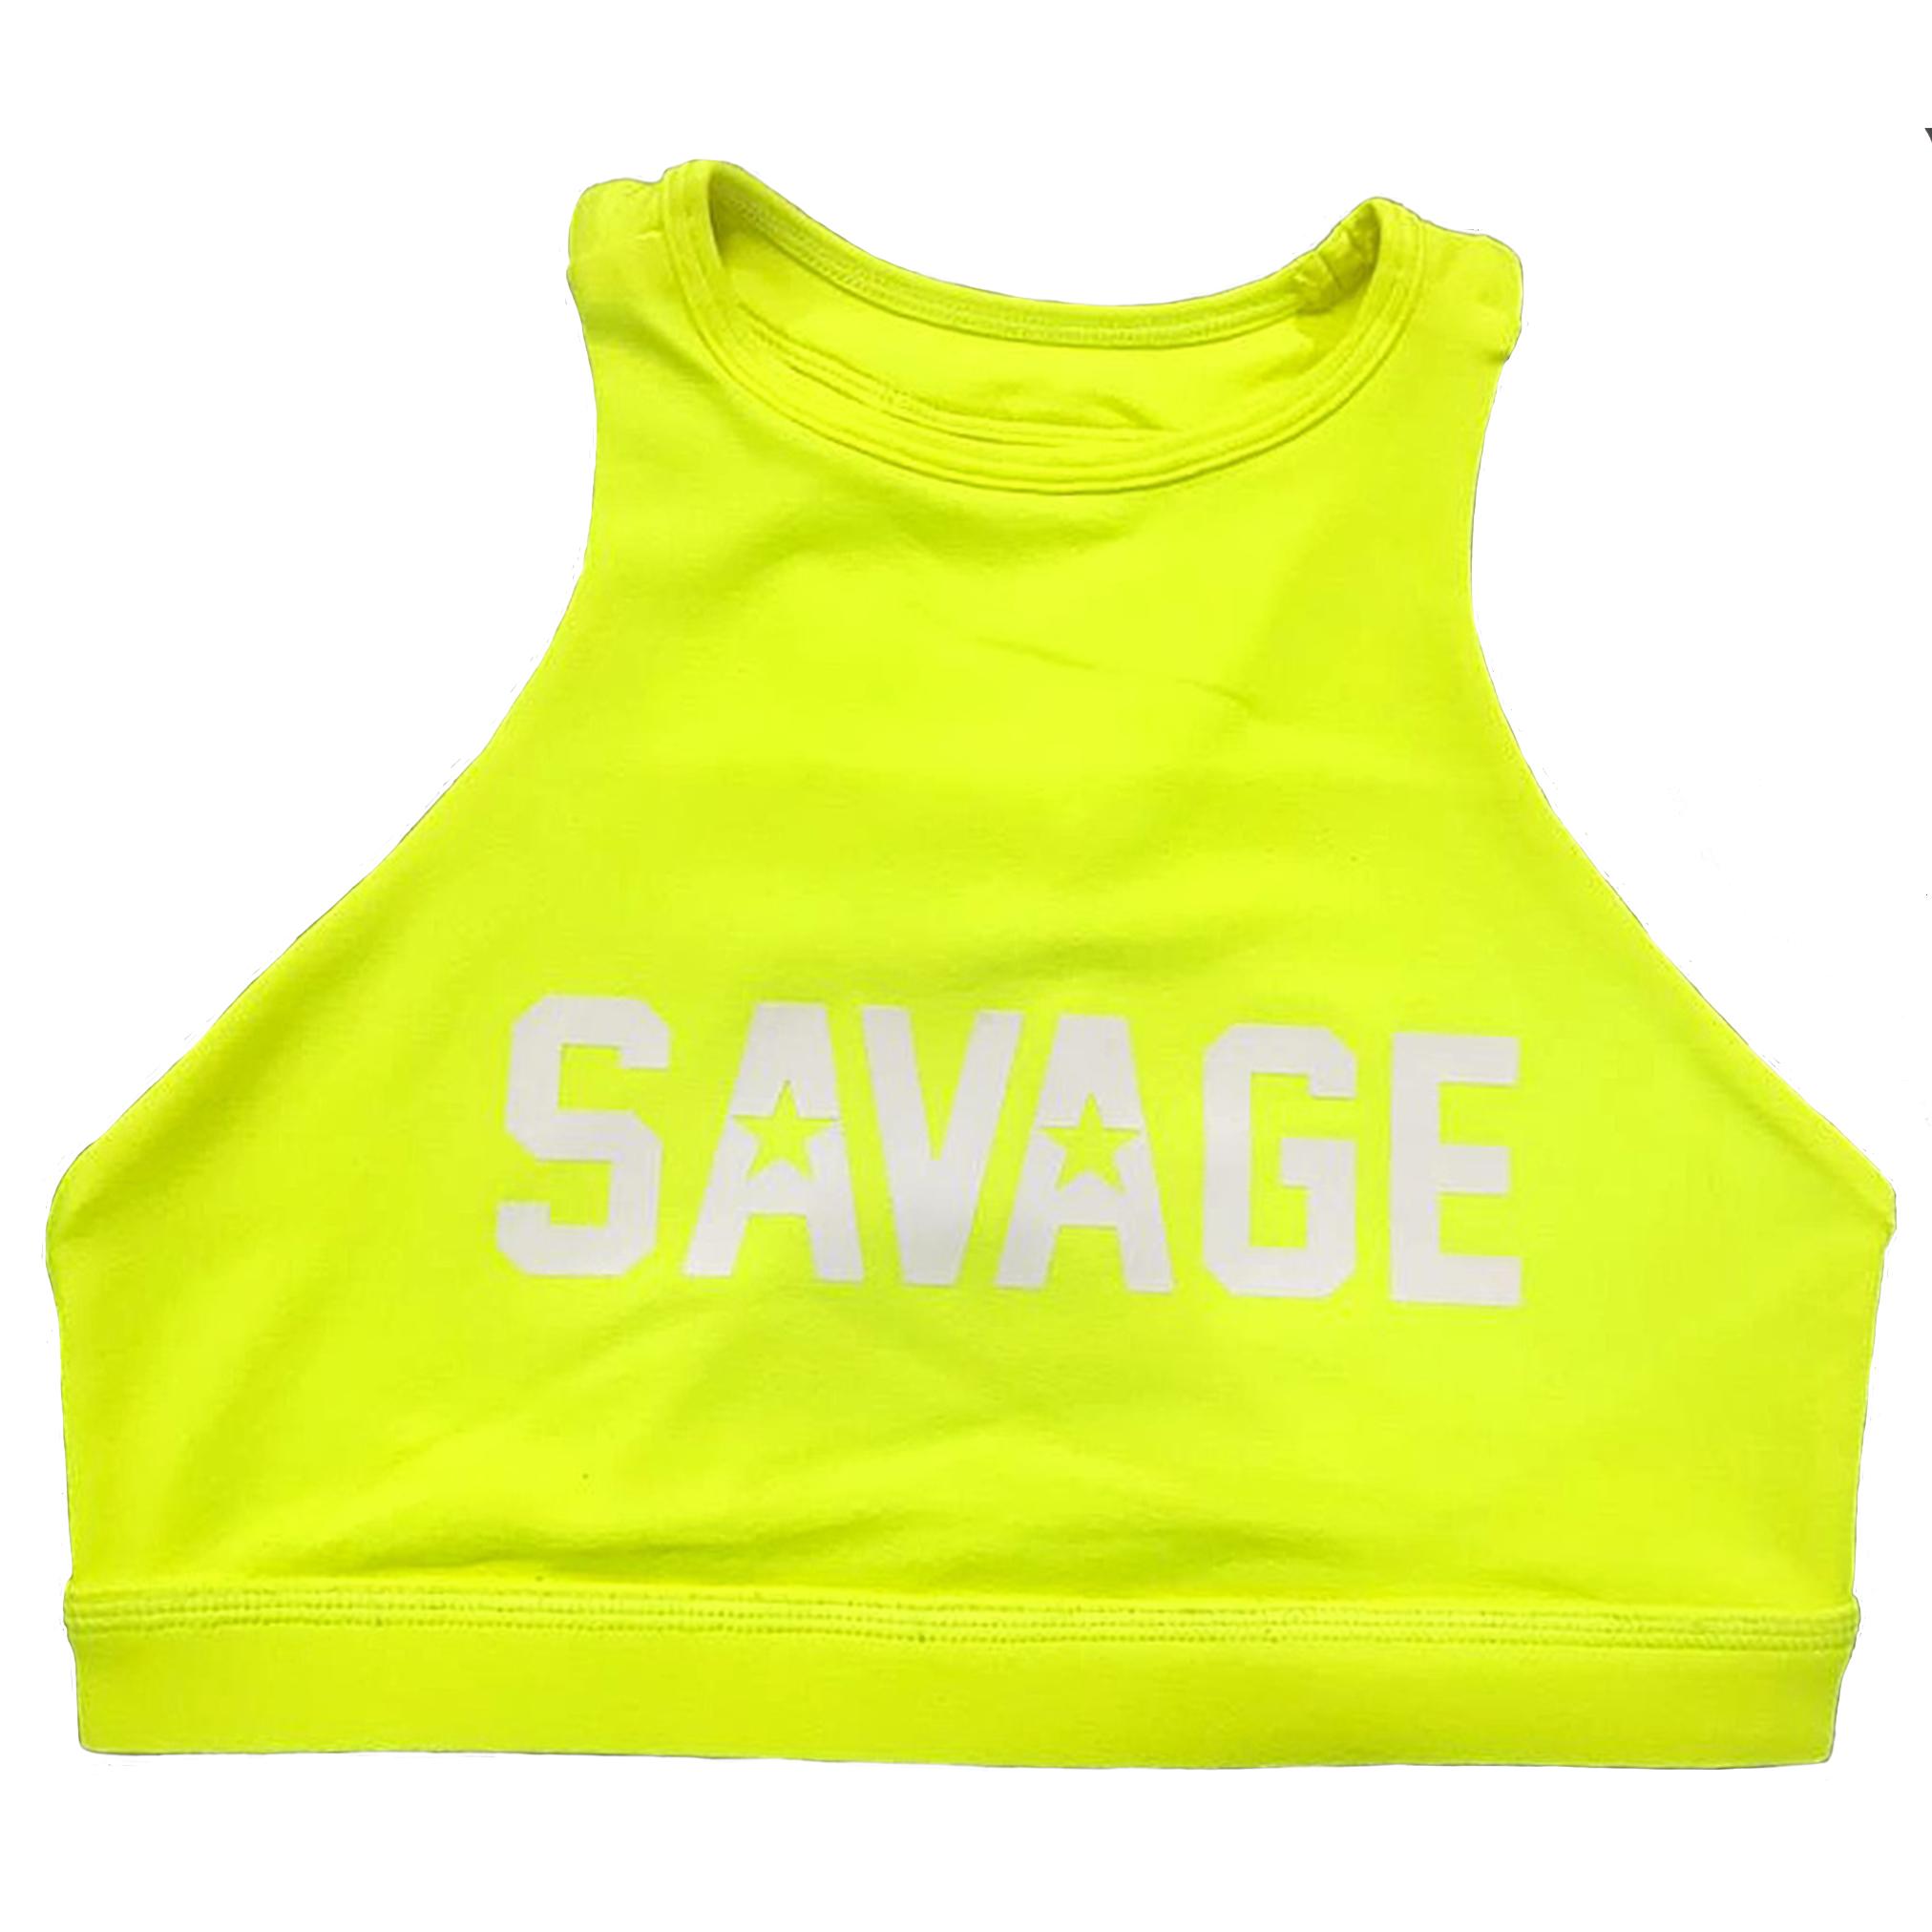 Savage Barbell Sports Bra - High Neck Glow Stick